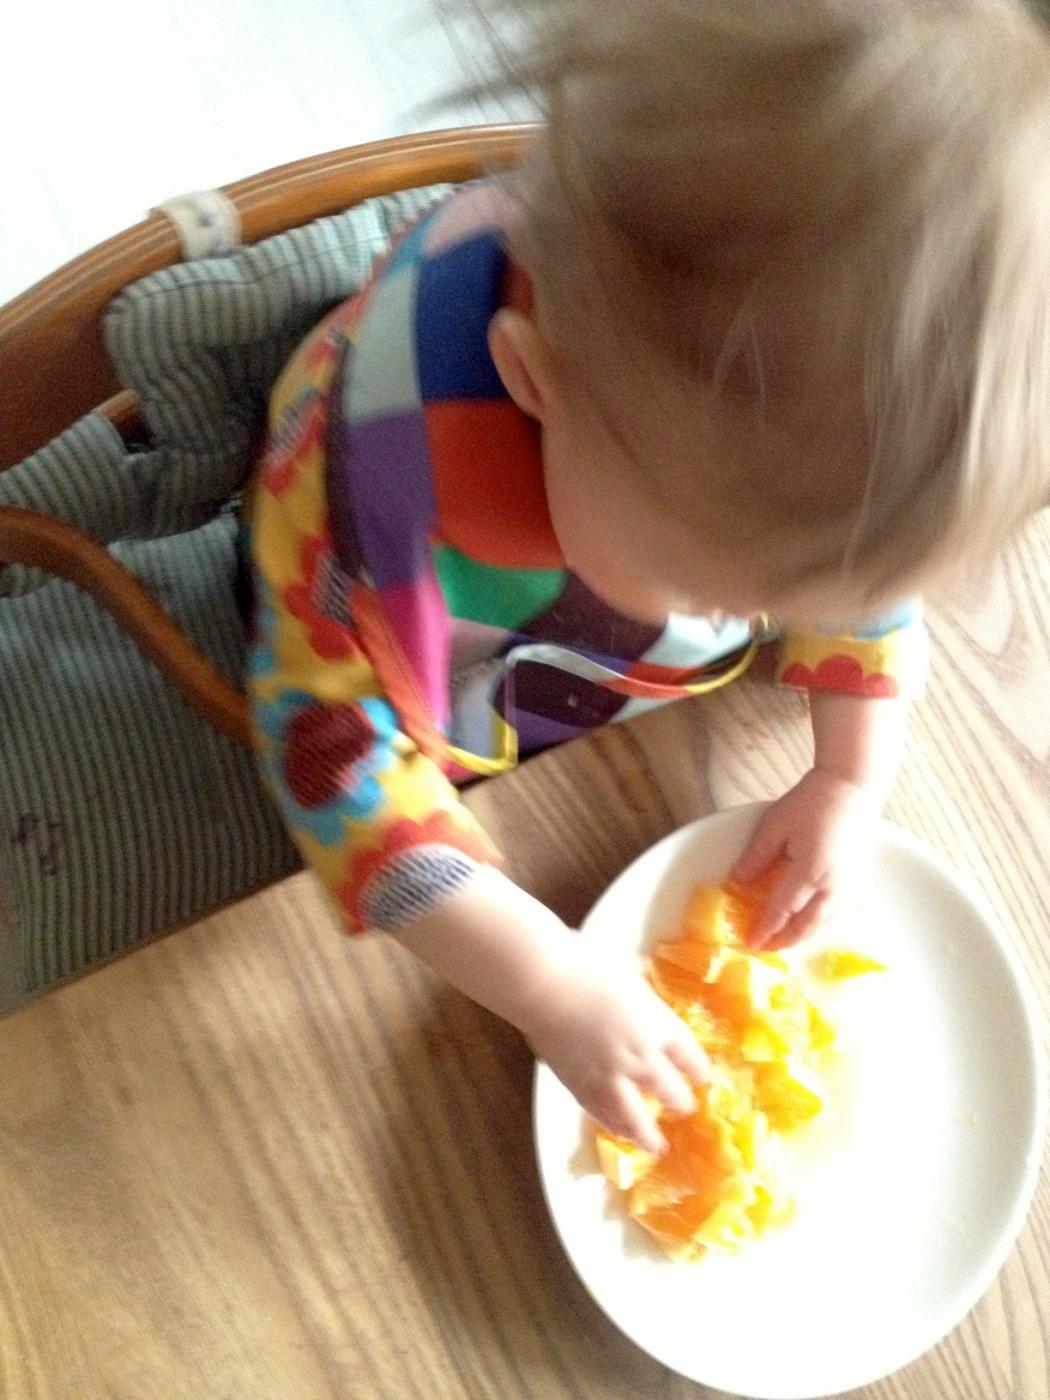 Alle yksivuotiaan ruoat